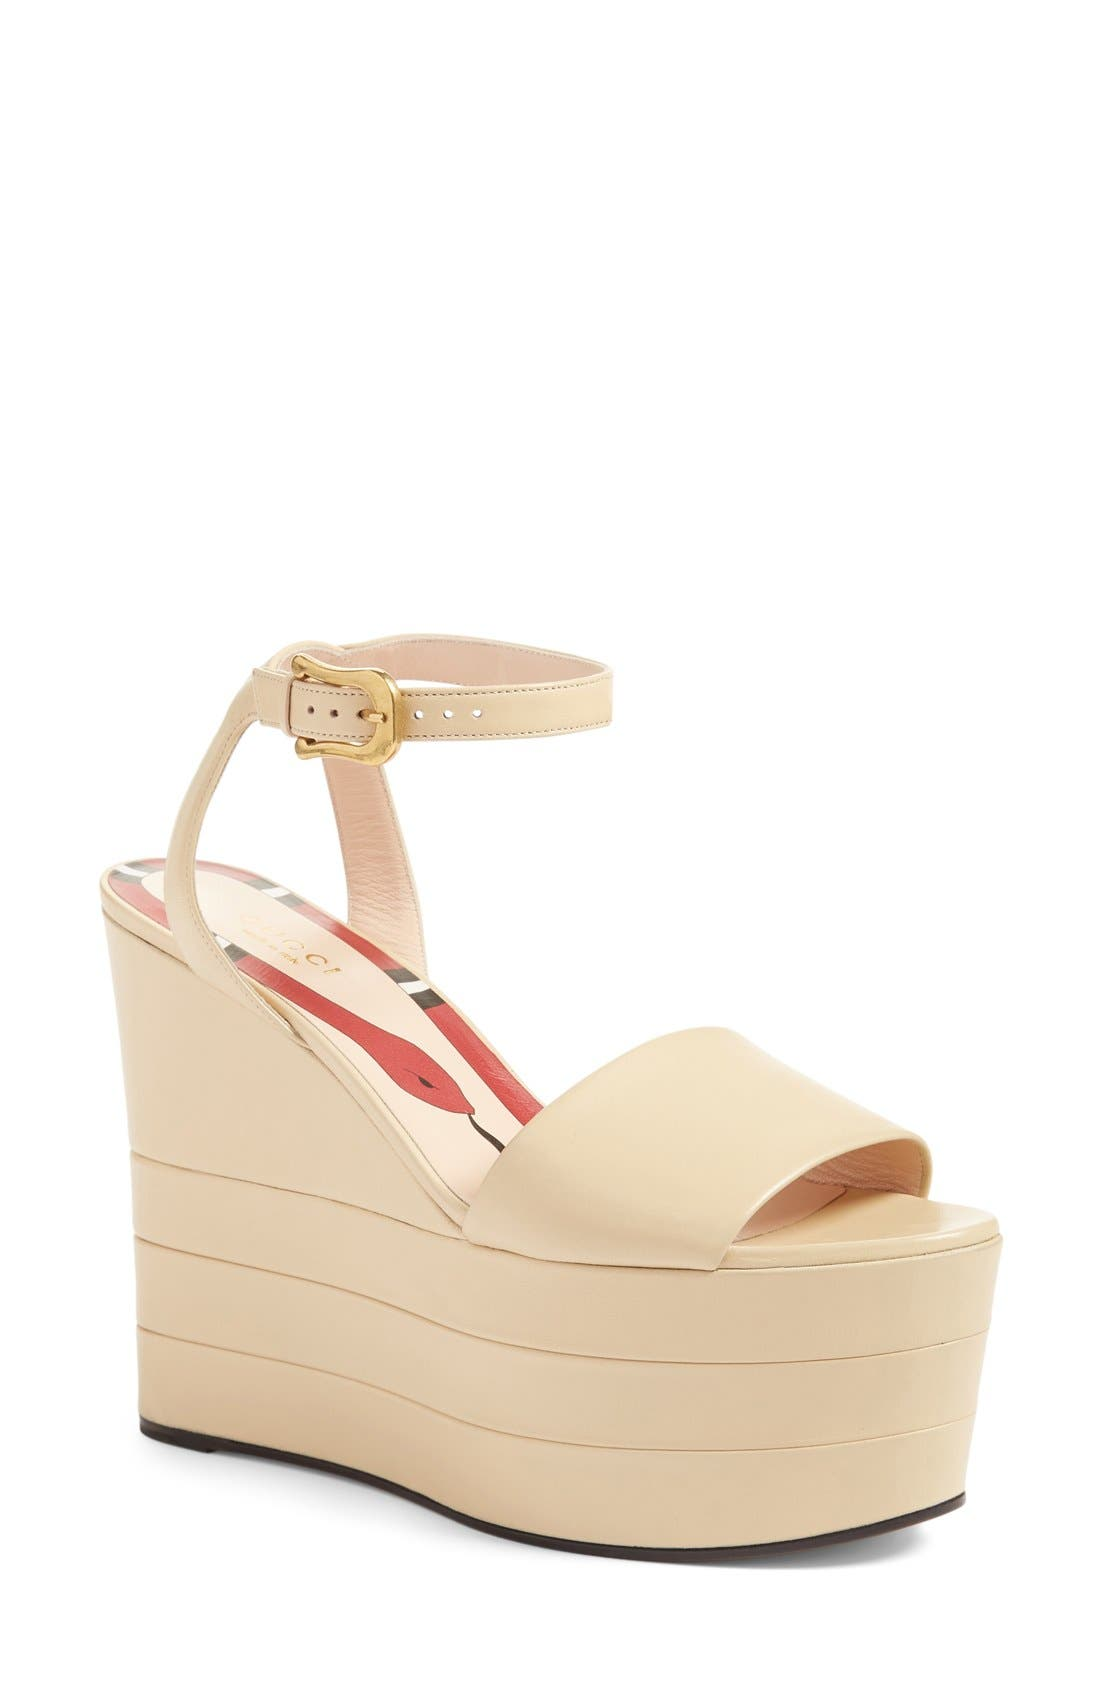 Main Image - Gucci 'Sally' Platform Sandal (Women)